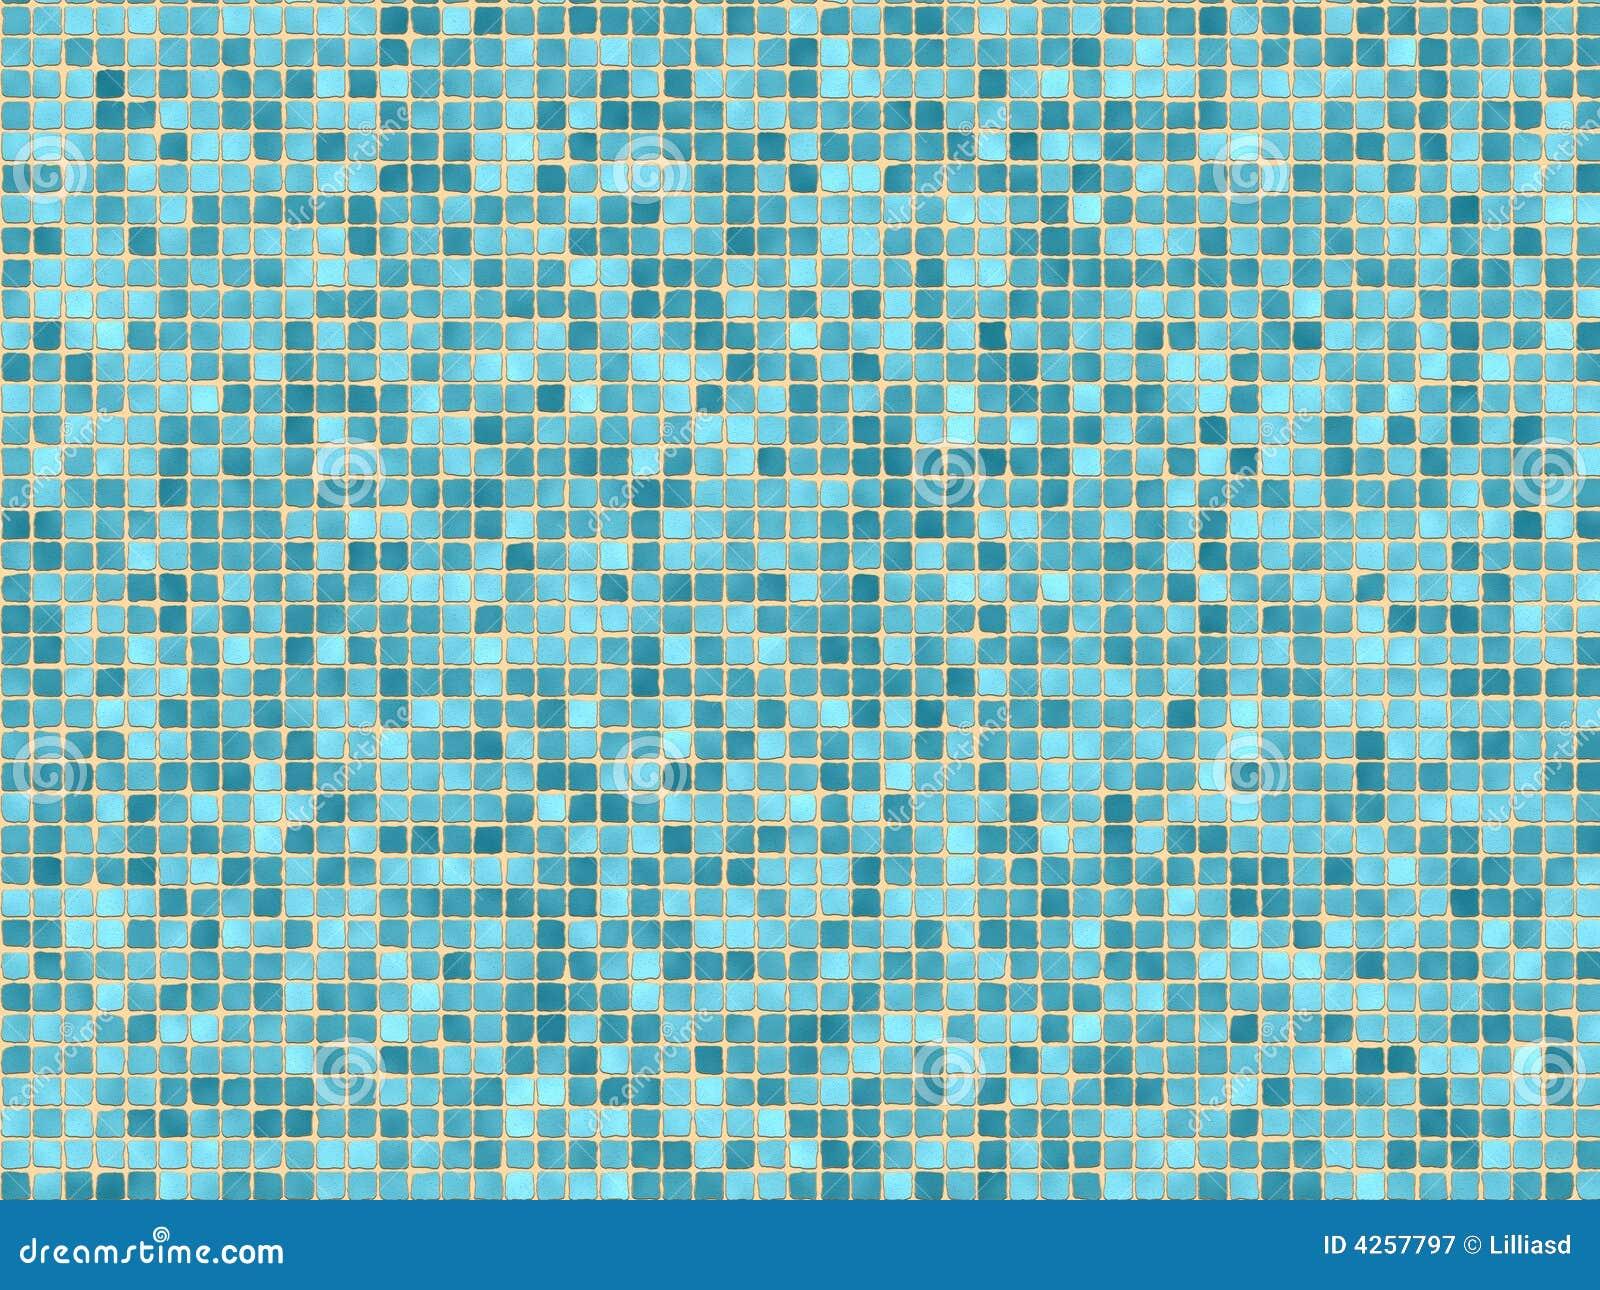 Royalty Free Stock Photography Blue Mosaic Tiles Image4257797 on Bathroom Floor Plans 9 X 12